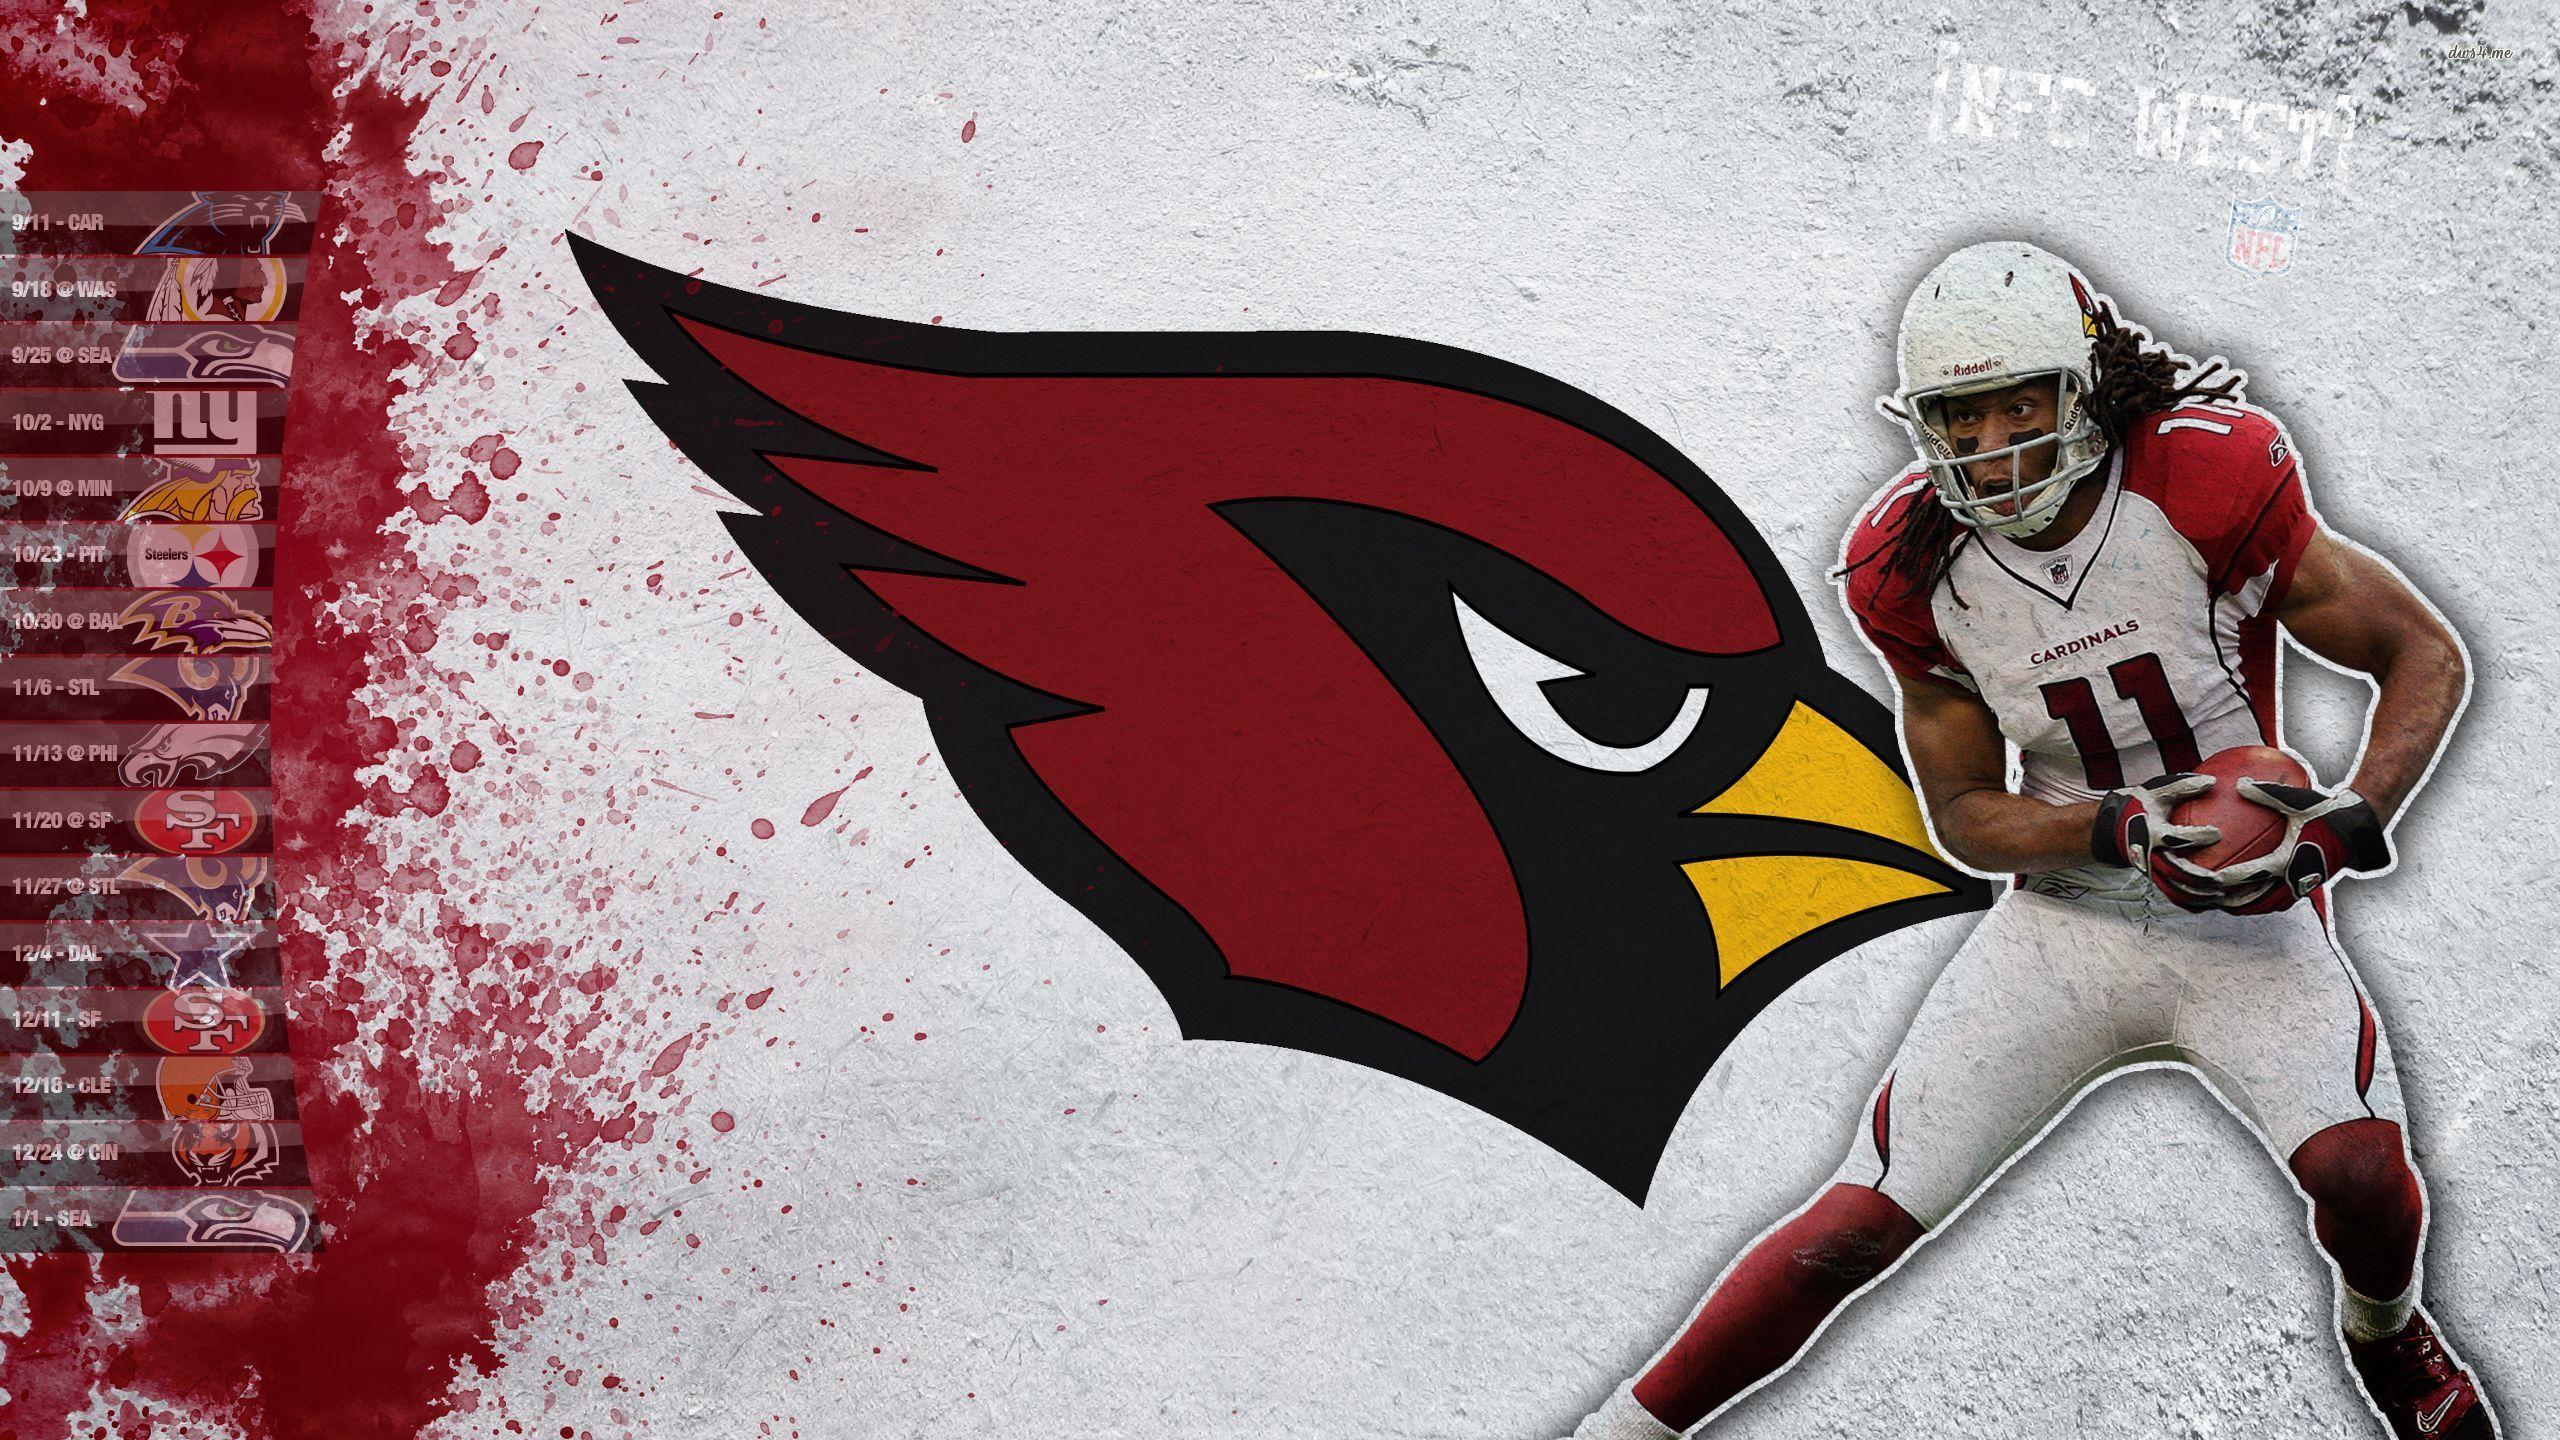 Oregon Football Wallpaper Hd Free Arizona Cardinals Wallpapers Download Pixelstalk Net